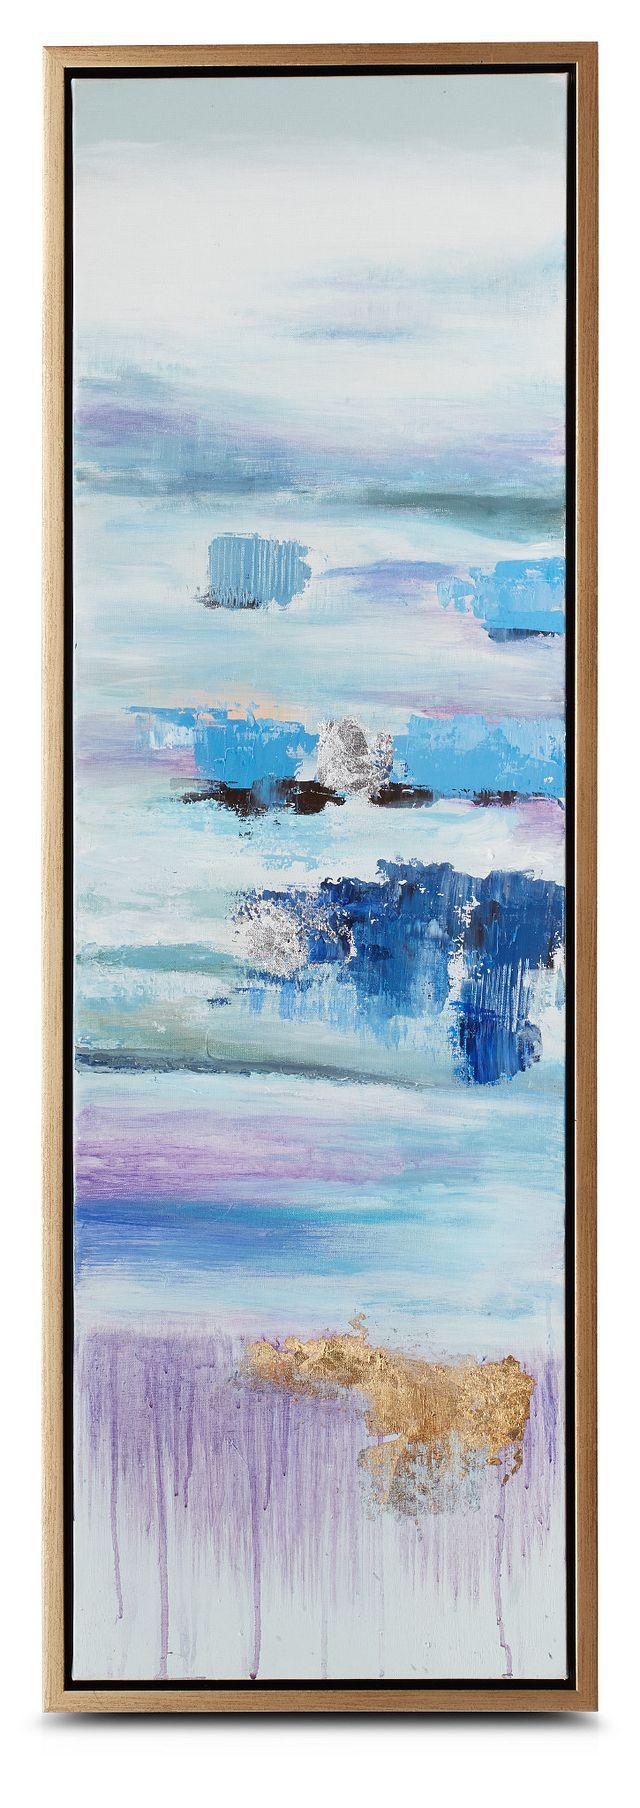 Athena Blue Set Of 3 Framed Canvas Wall Art (1)